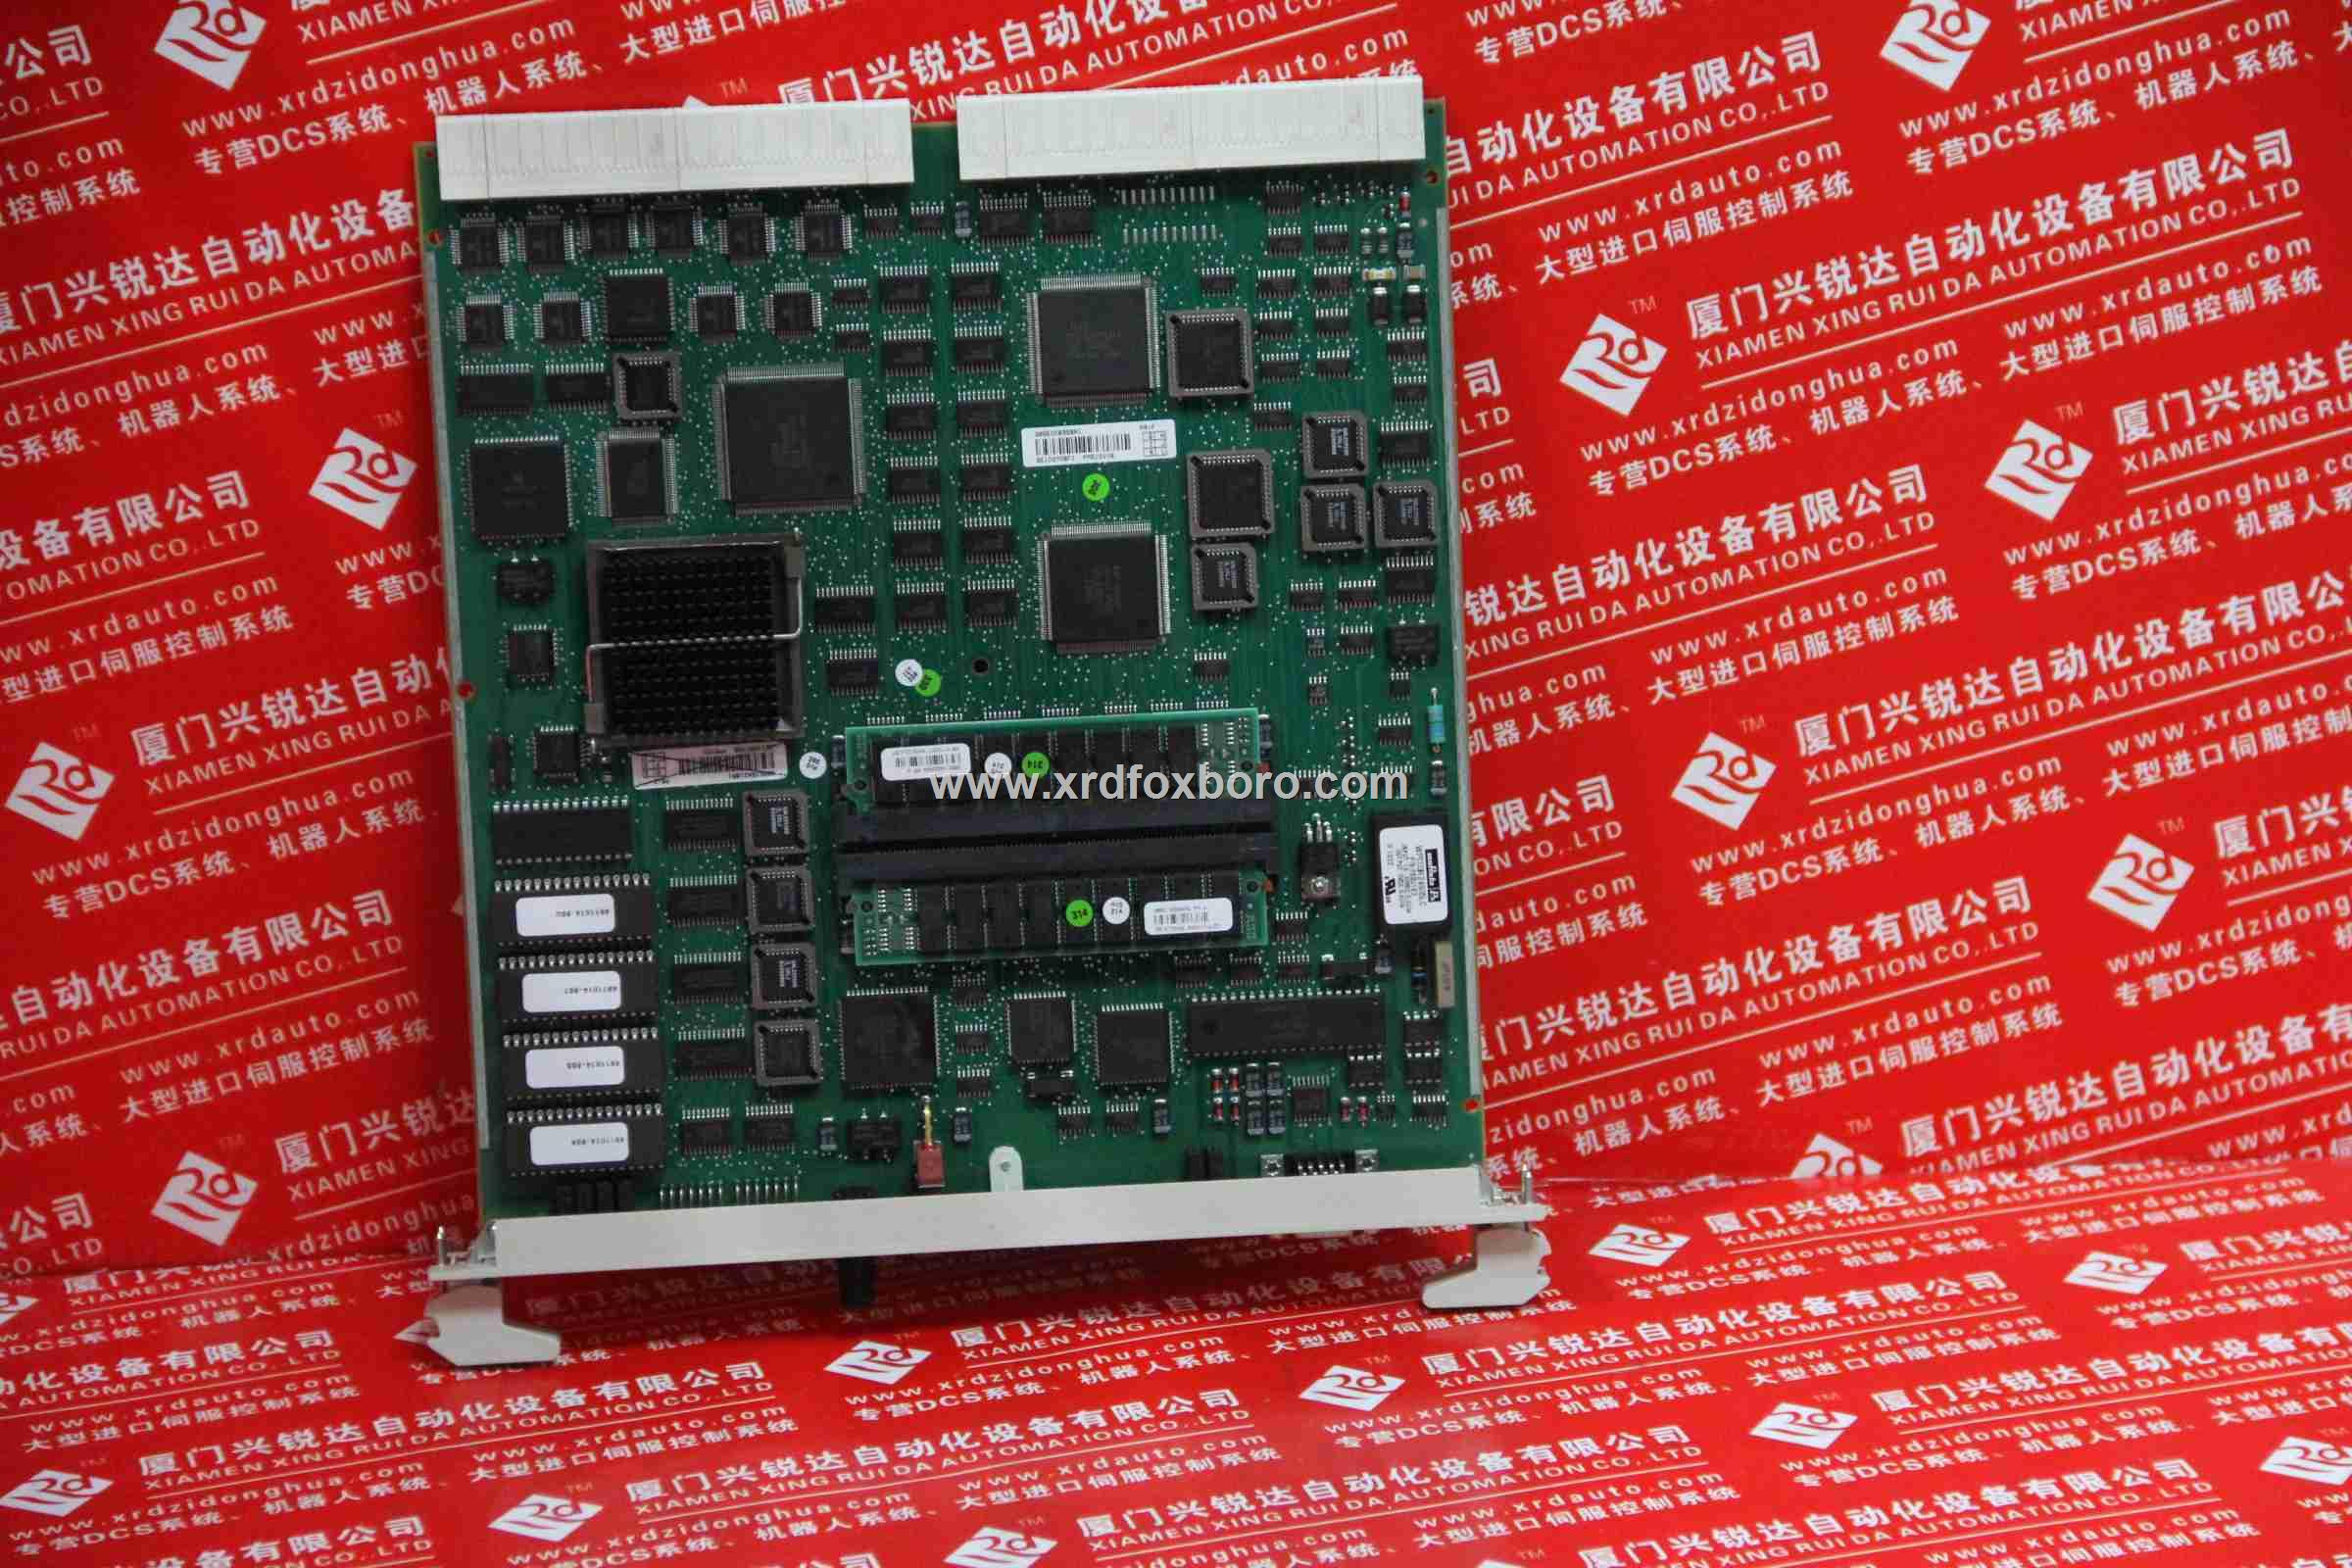 电路板 2400_1600